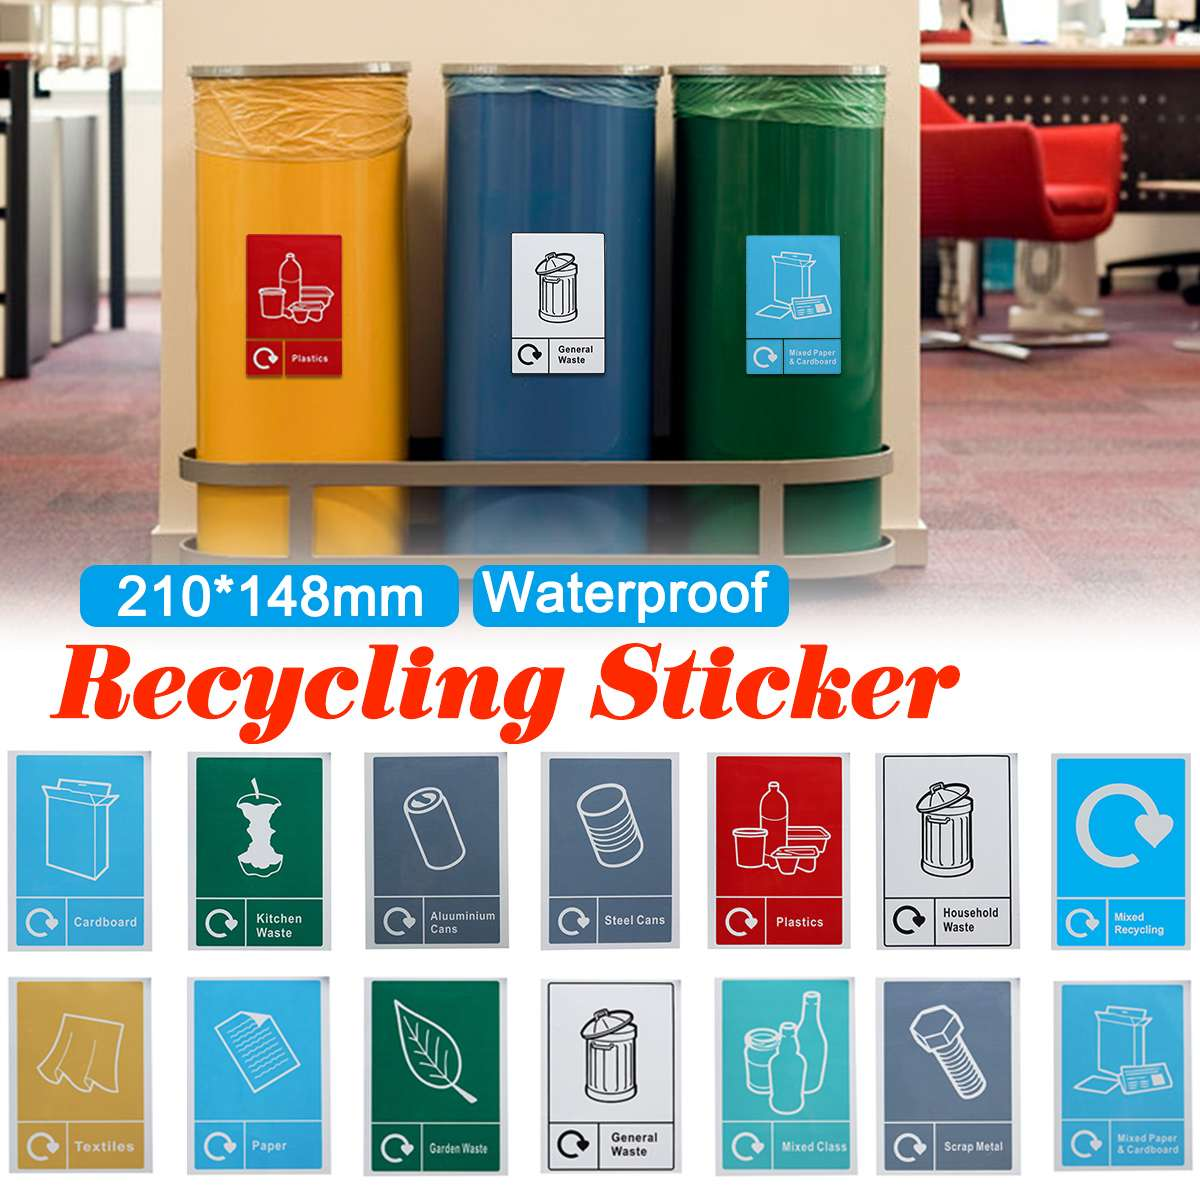 Trash Bin Stickers Classification Sign Recycle Bin Recycling Sticker Waste Signage Sign Waterproof General Waste Logo Garbage